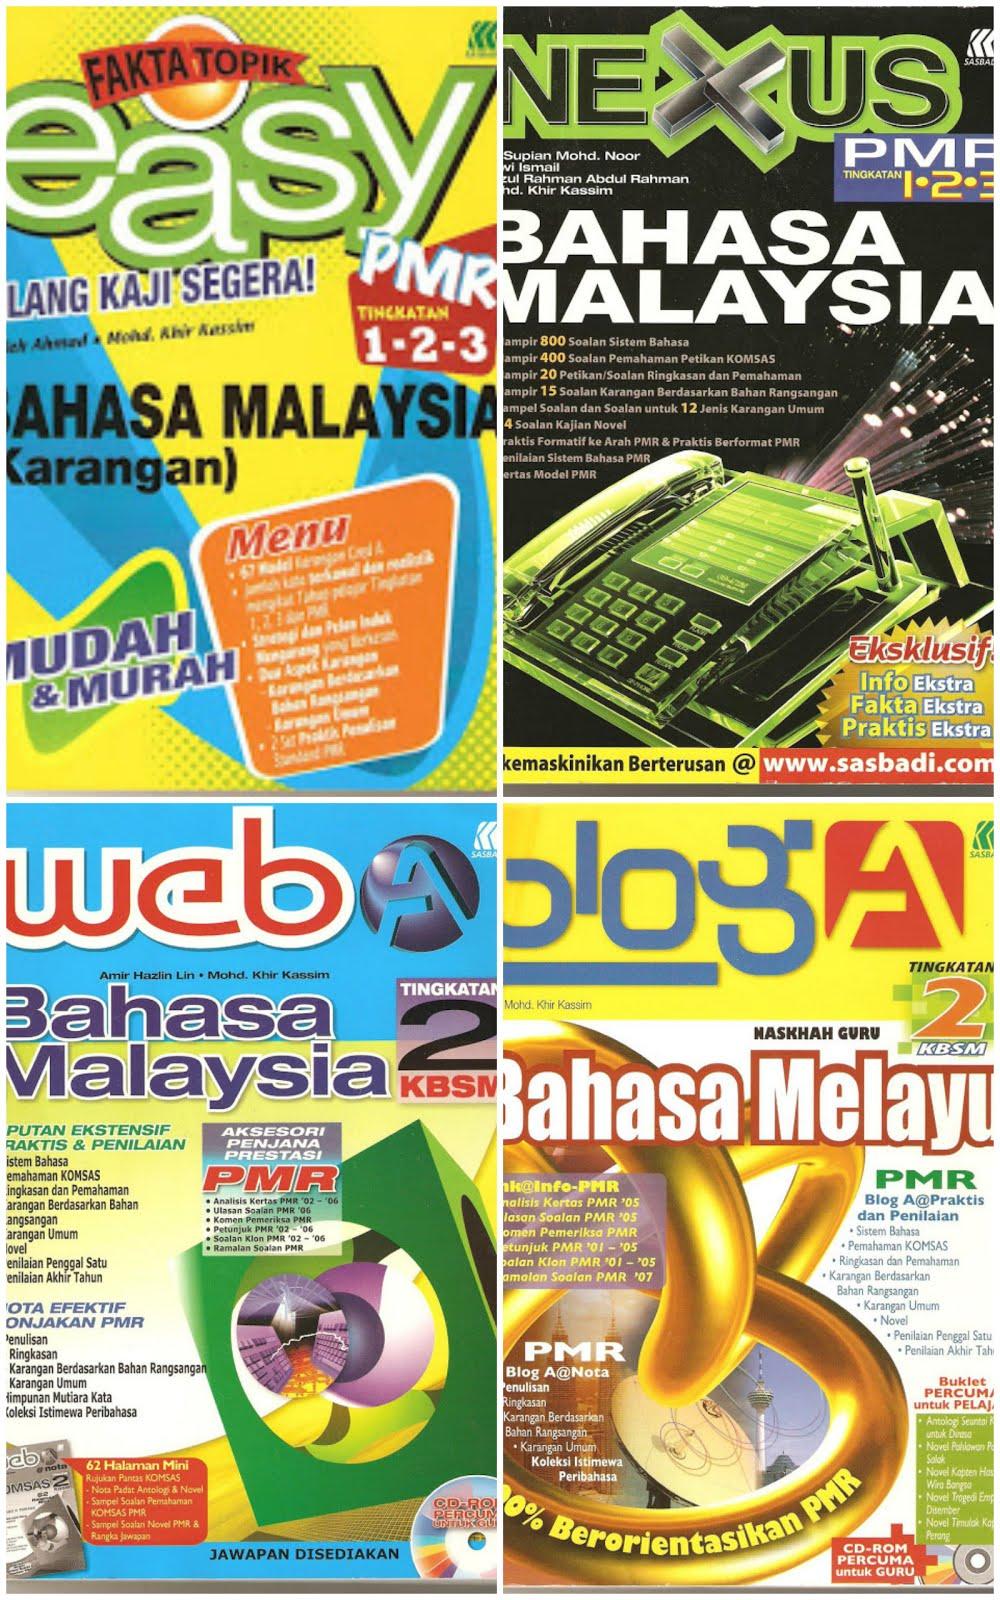 Buku Karangan PMR 2009/Buku Nexus PMR 2008/Buku Web T2 BM 2008/Buku Blog A BM T2 2007